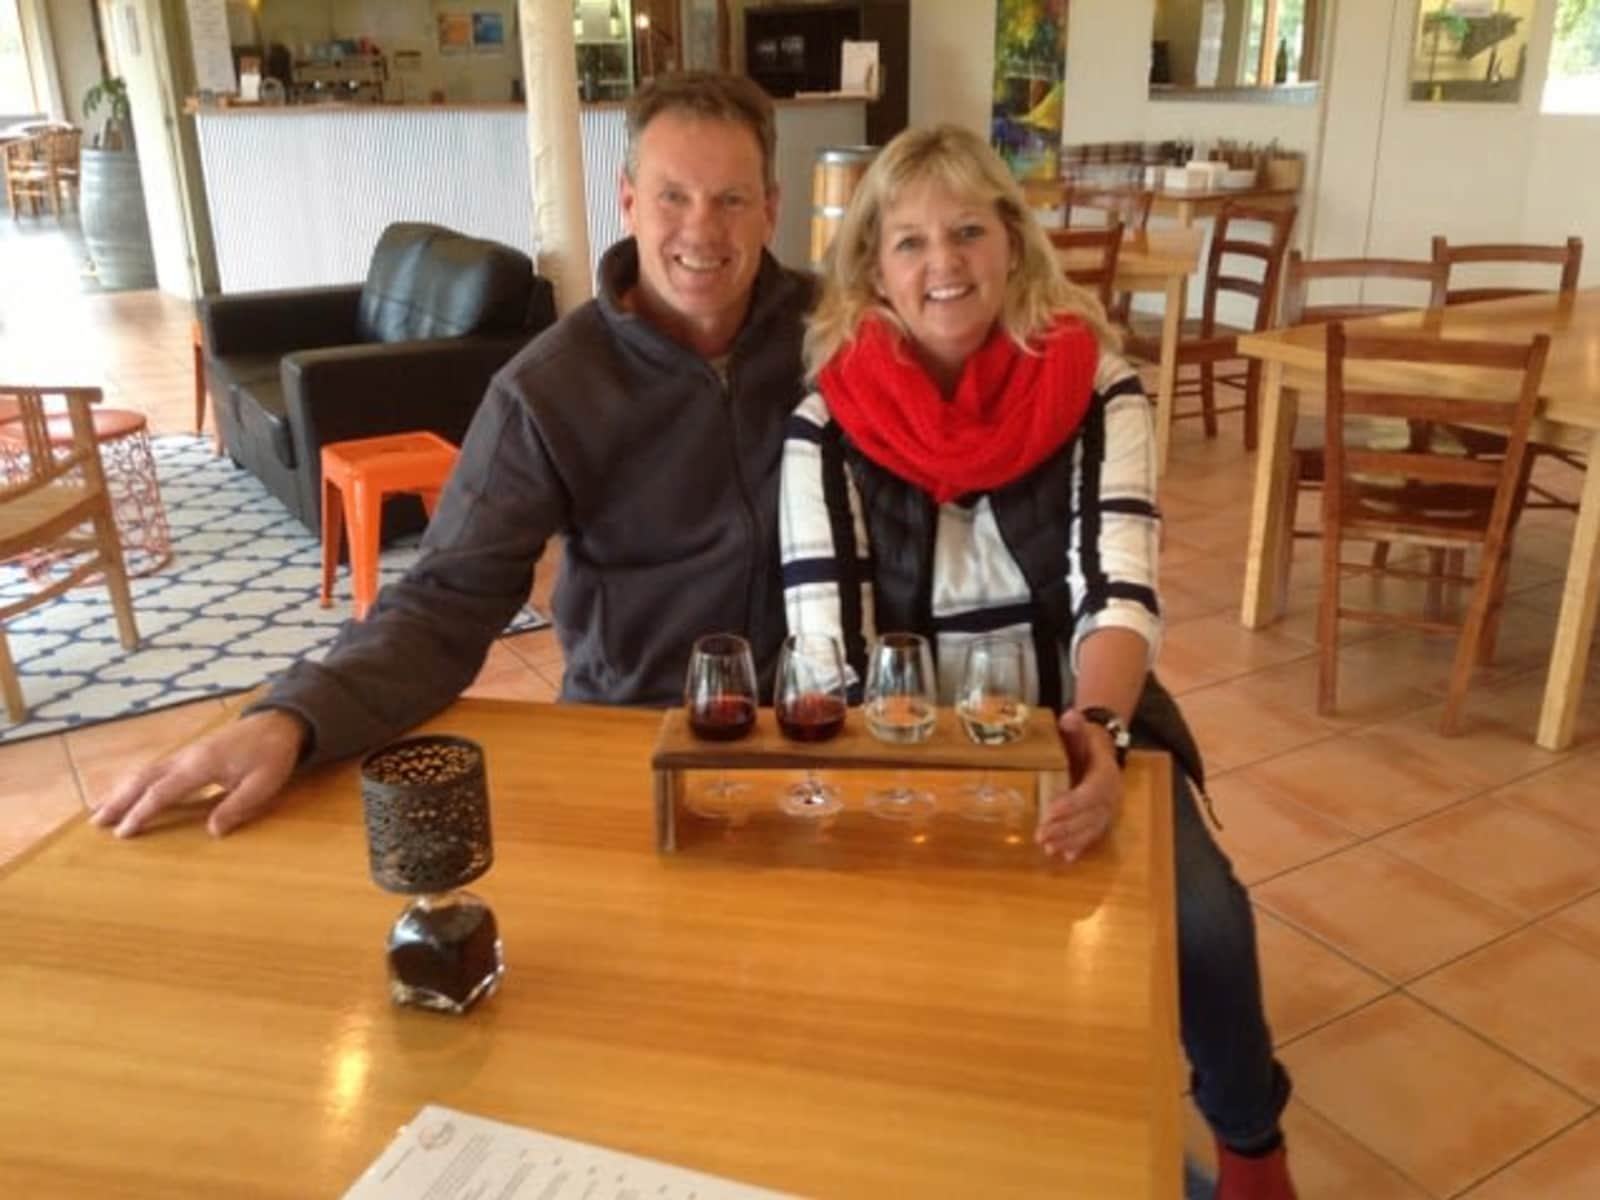 Karen & Brian from Geelong, Victoria, Australia